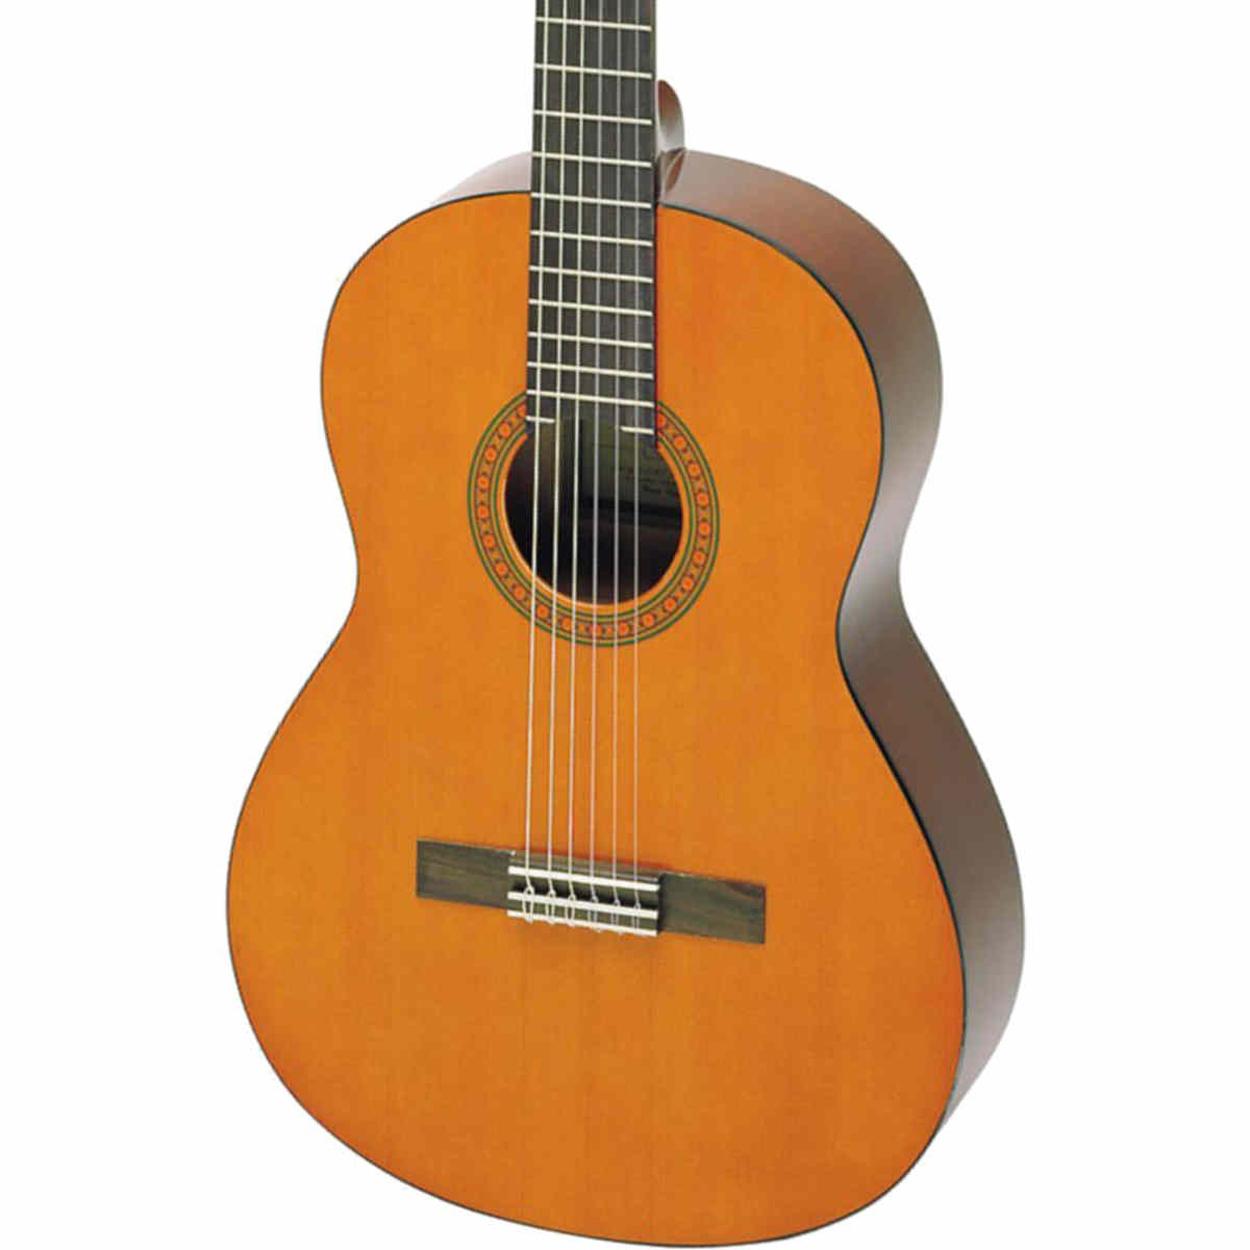 yamaha cs40 7 8 acoustic classical guitar music machine nz. Black Bedroom Furniture Sets. Home Design Ideas